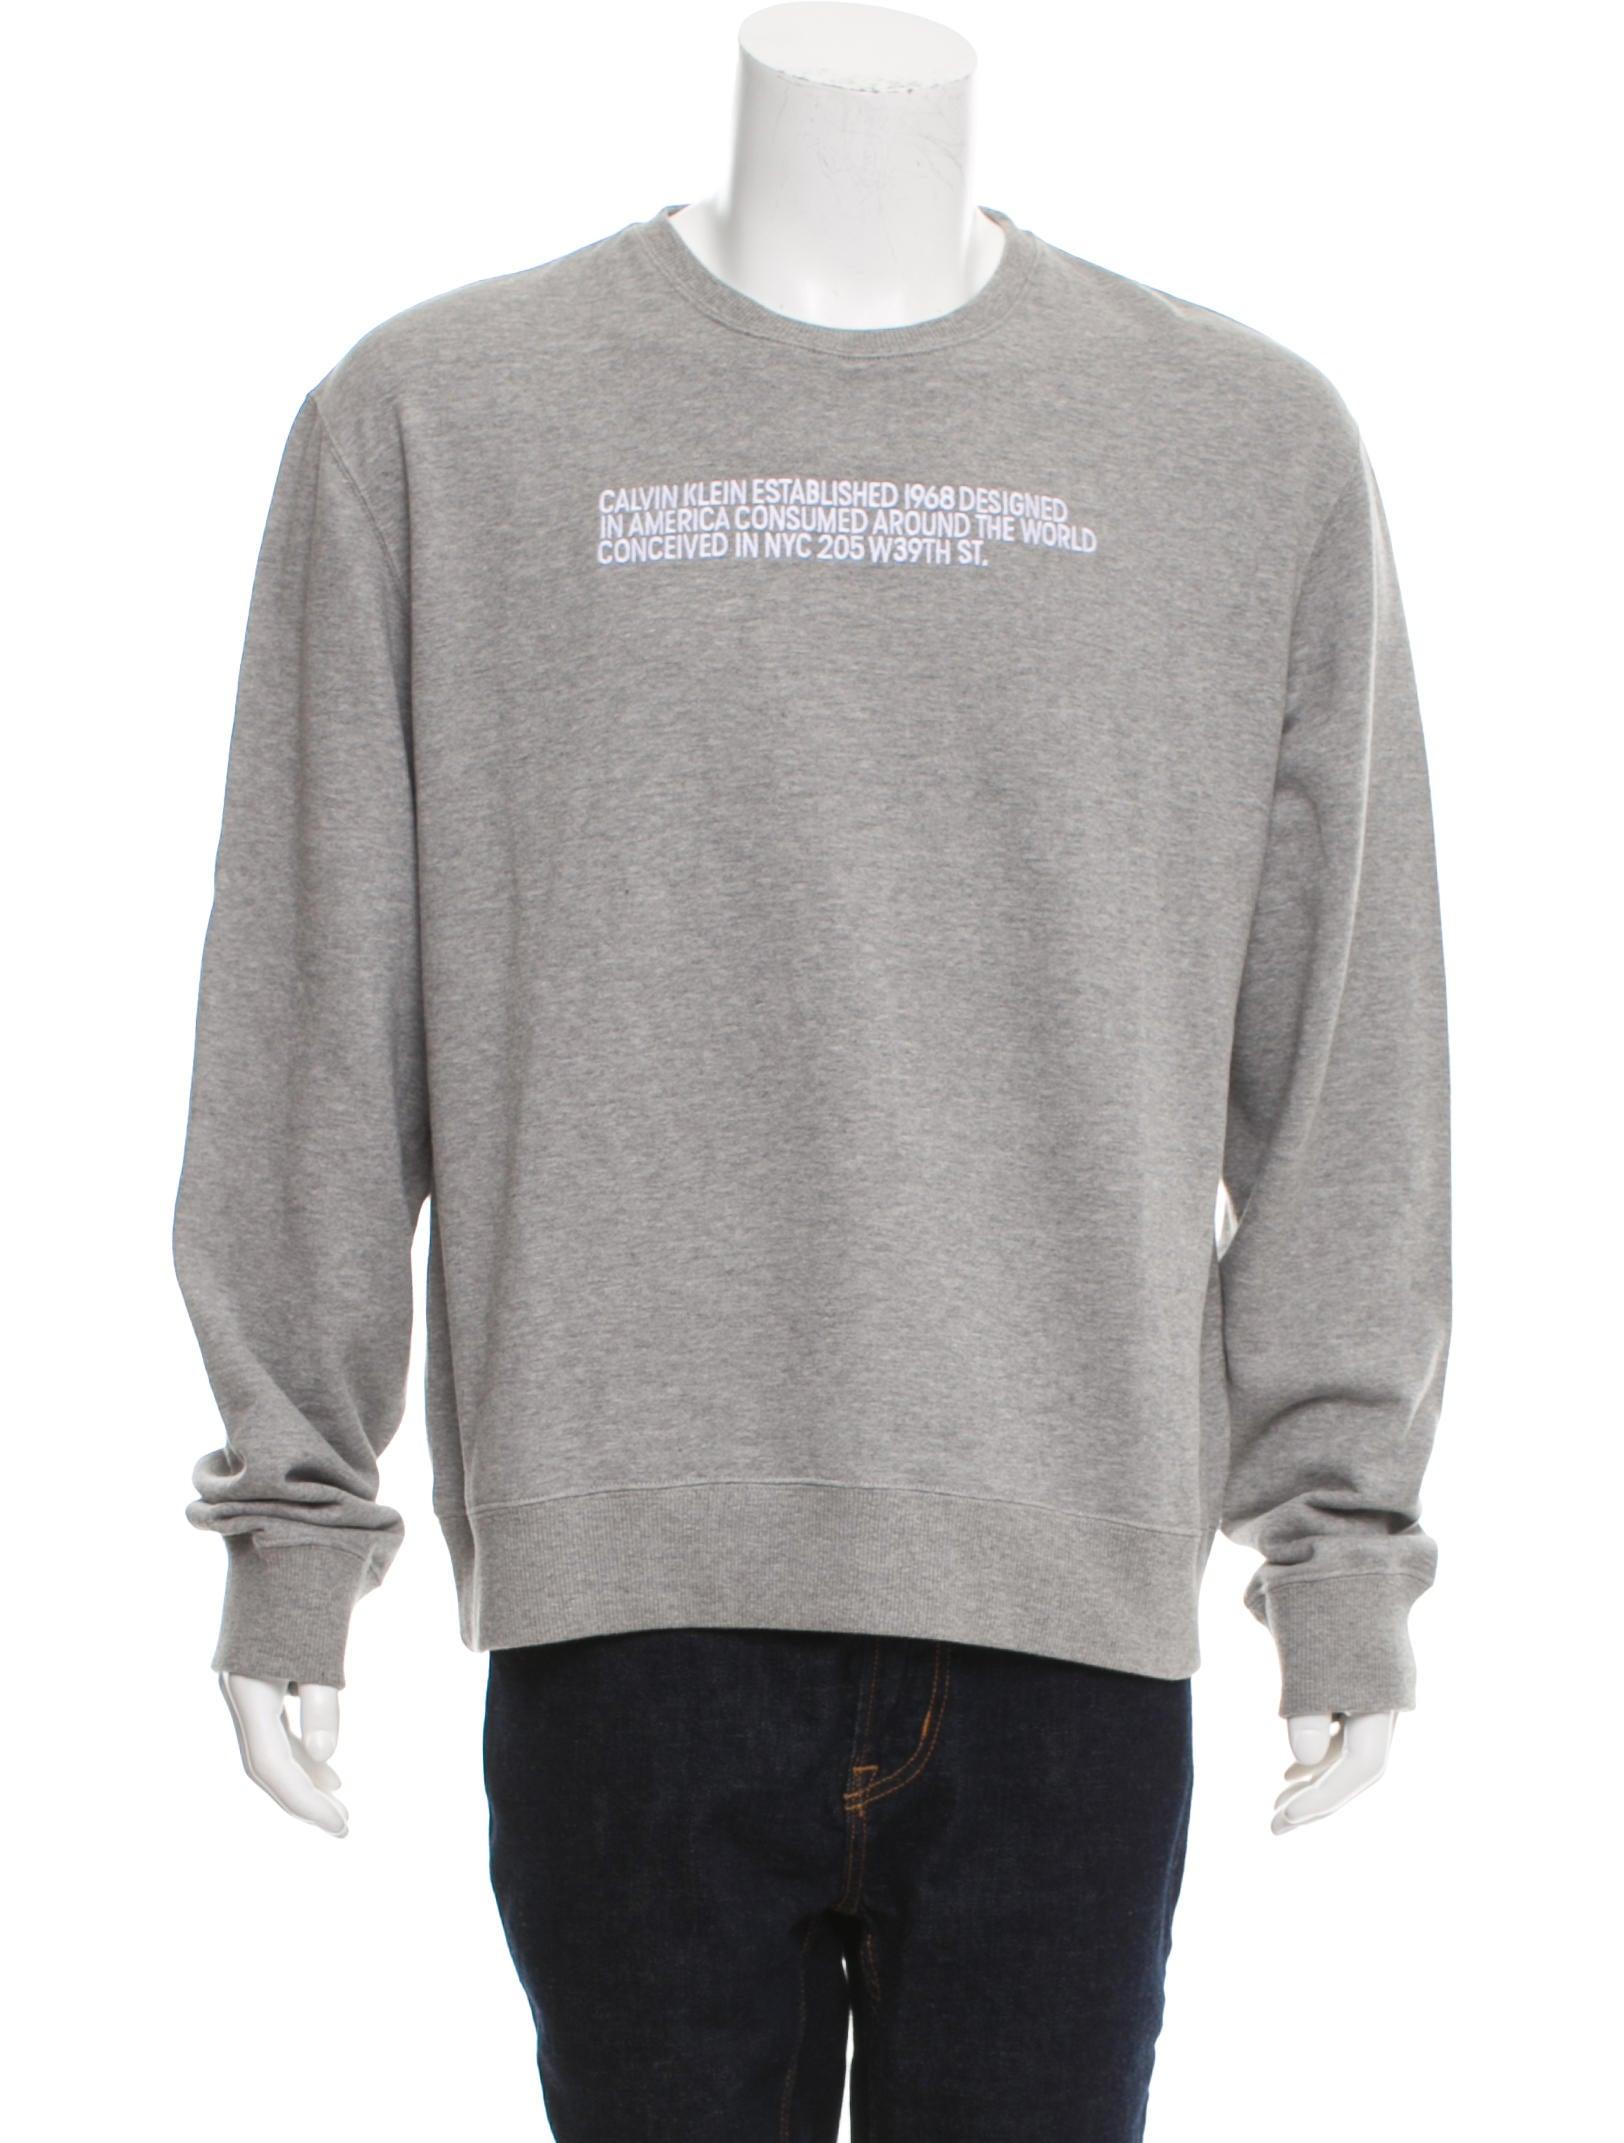 e33267842785 Calvin Klein 205W39NYC Crew Neck Sweater w  Tags - Clothing ...